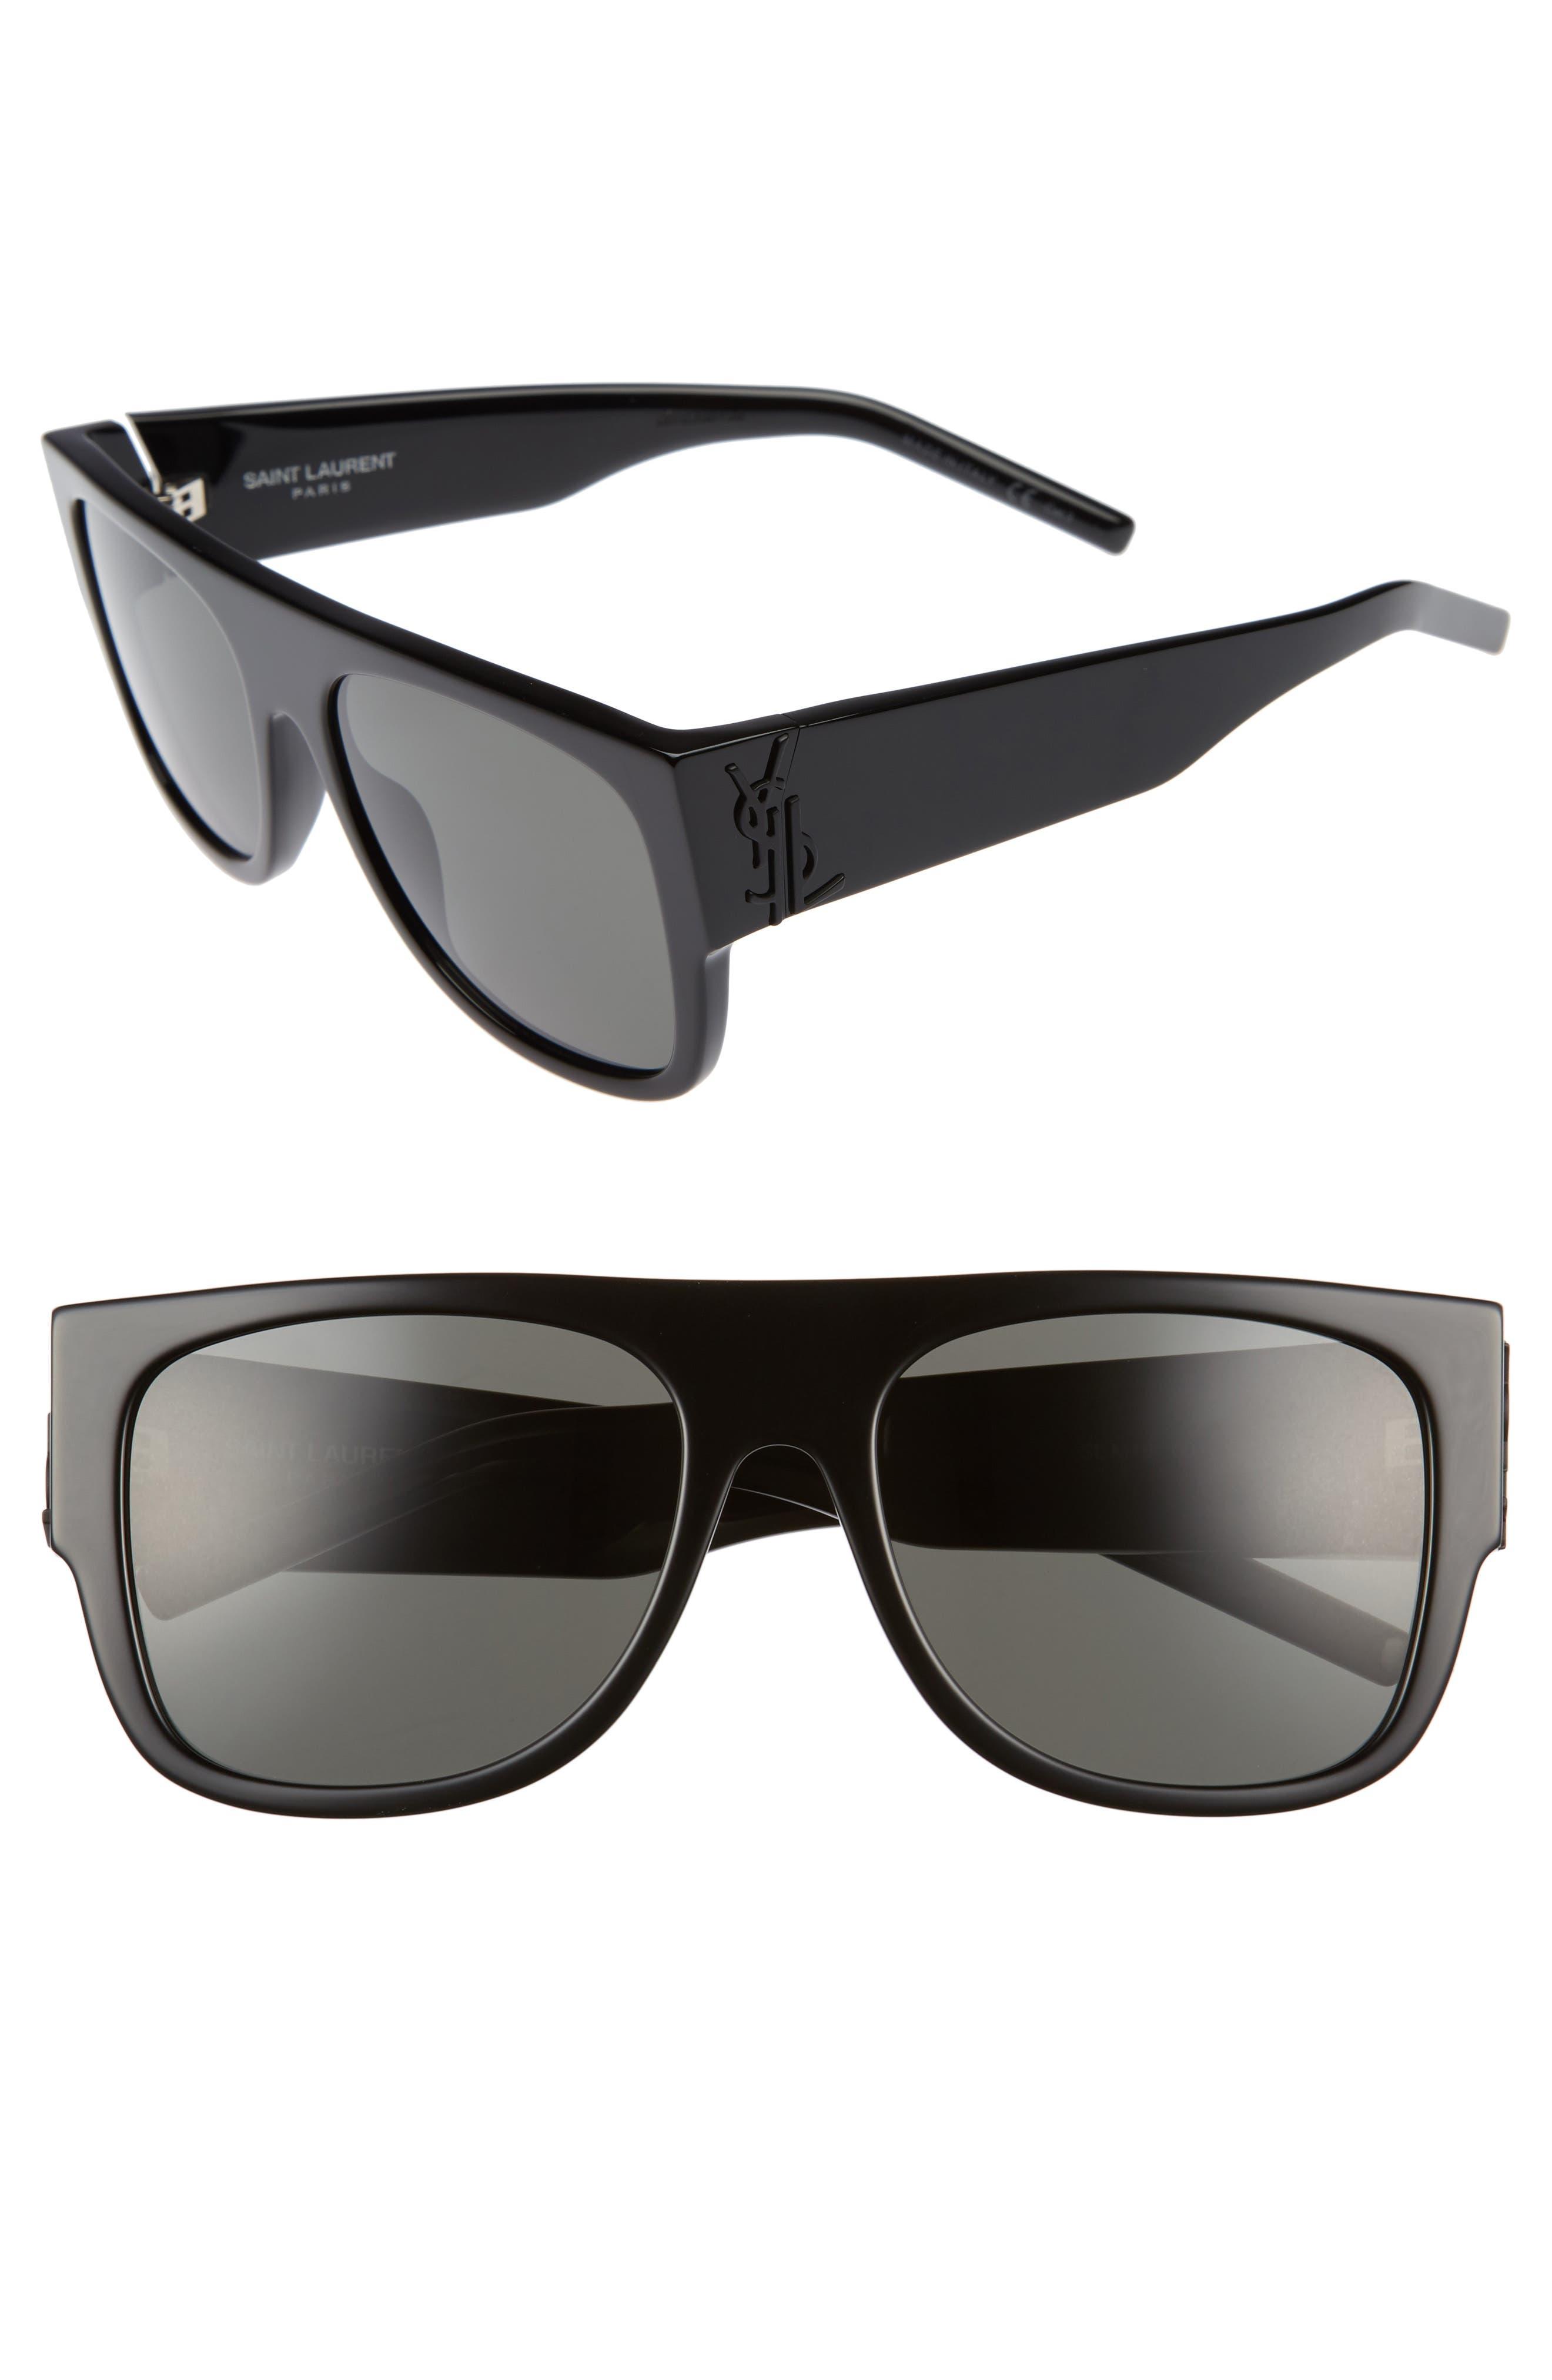 SL M16 55mm Flat Top Sunglasses,                             Main thumbnail 1, color,                             001